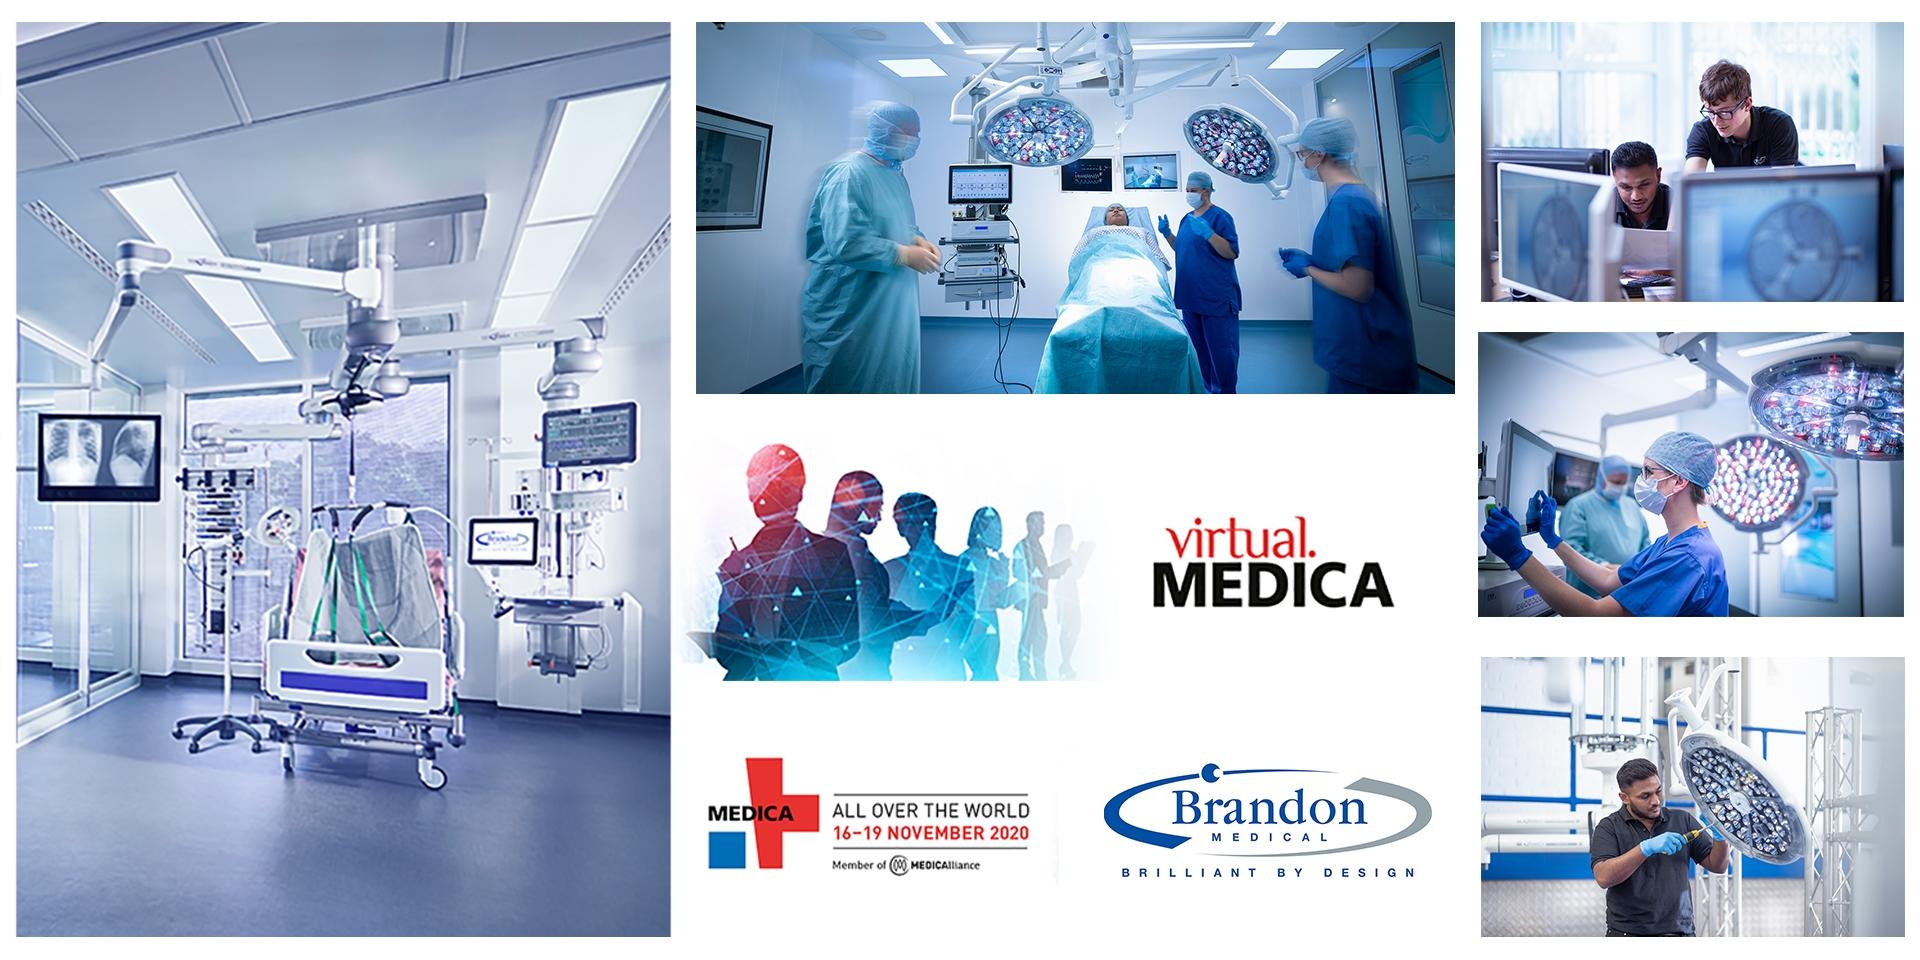 virtual-medica-2020-brandon-medical-event-2020.jpg